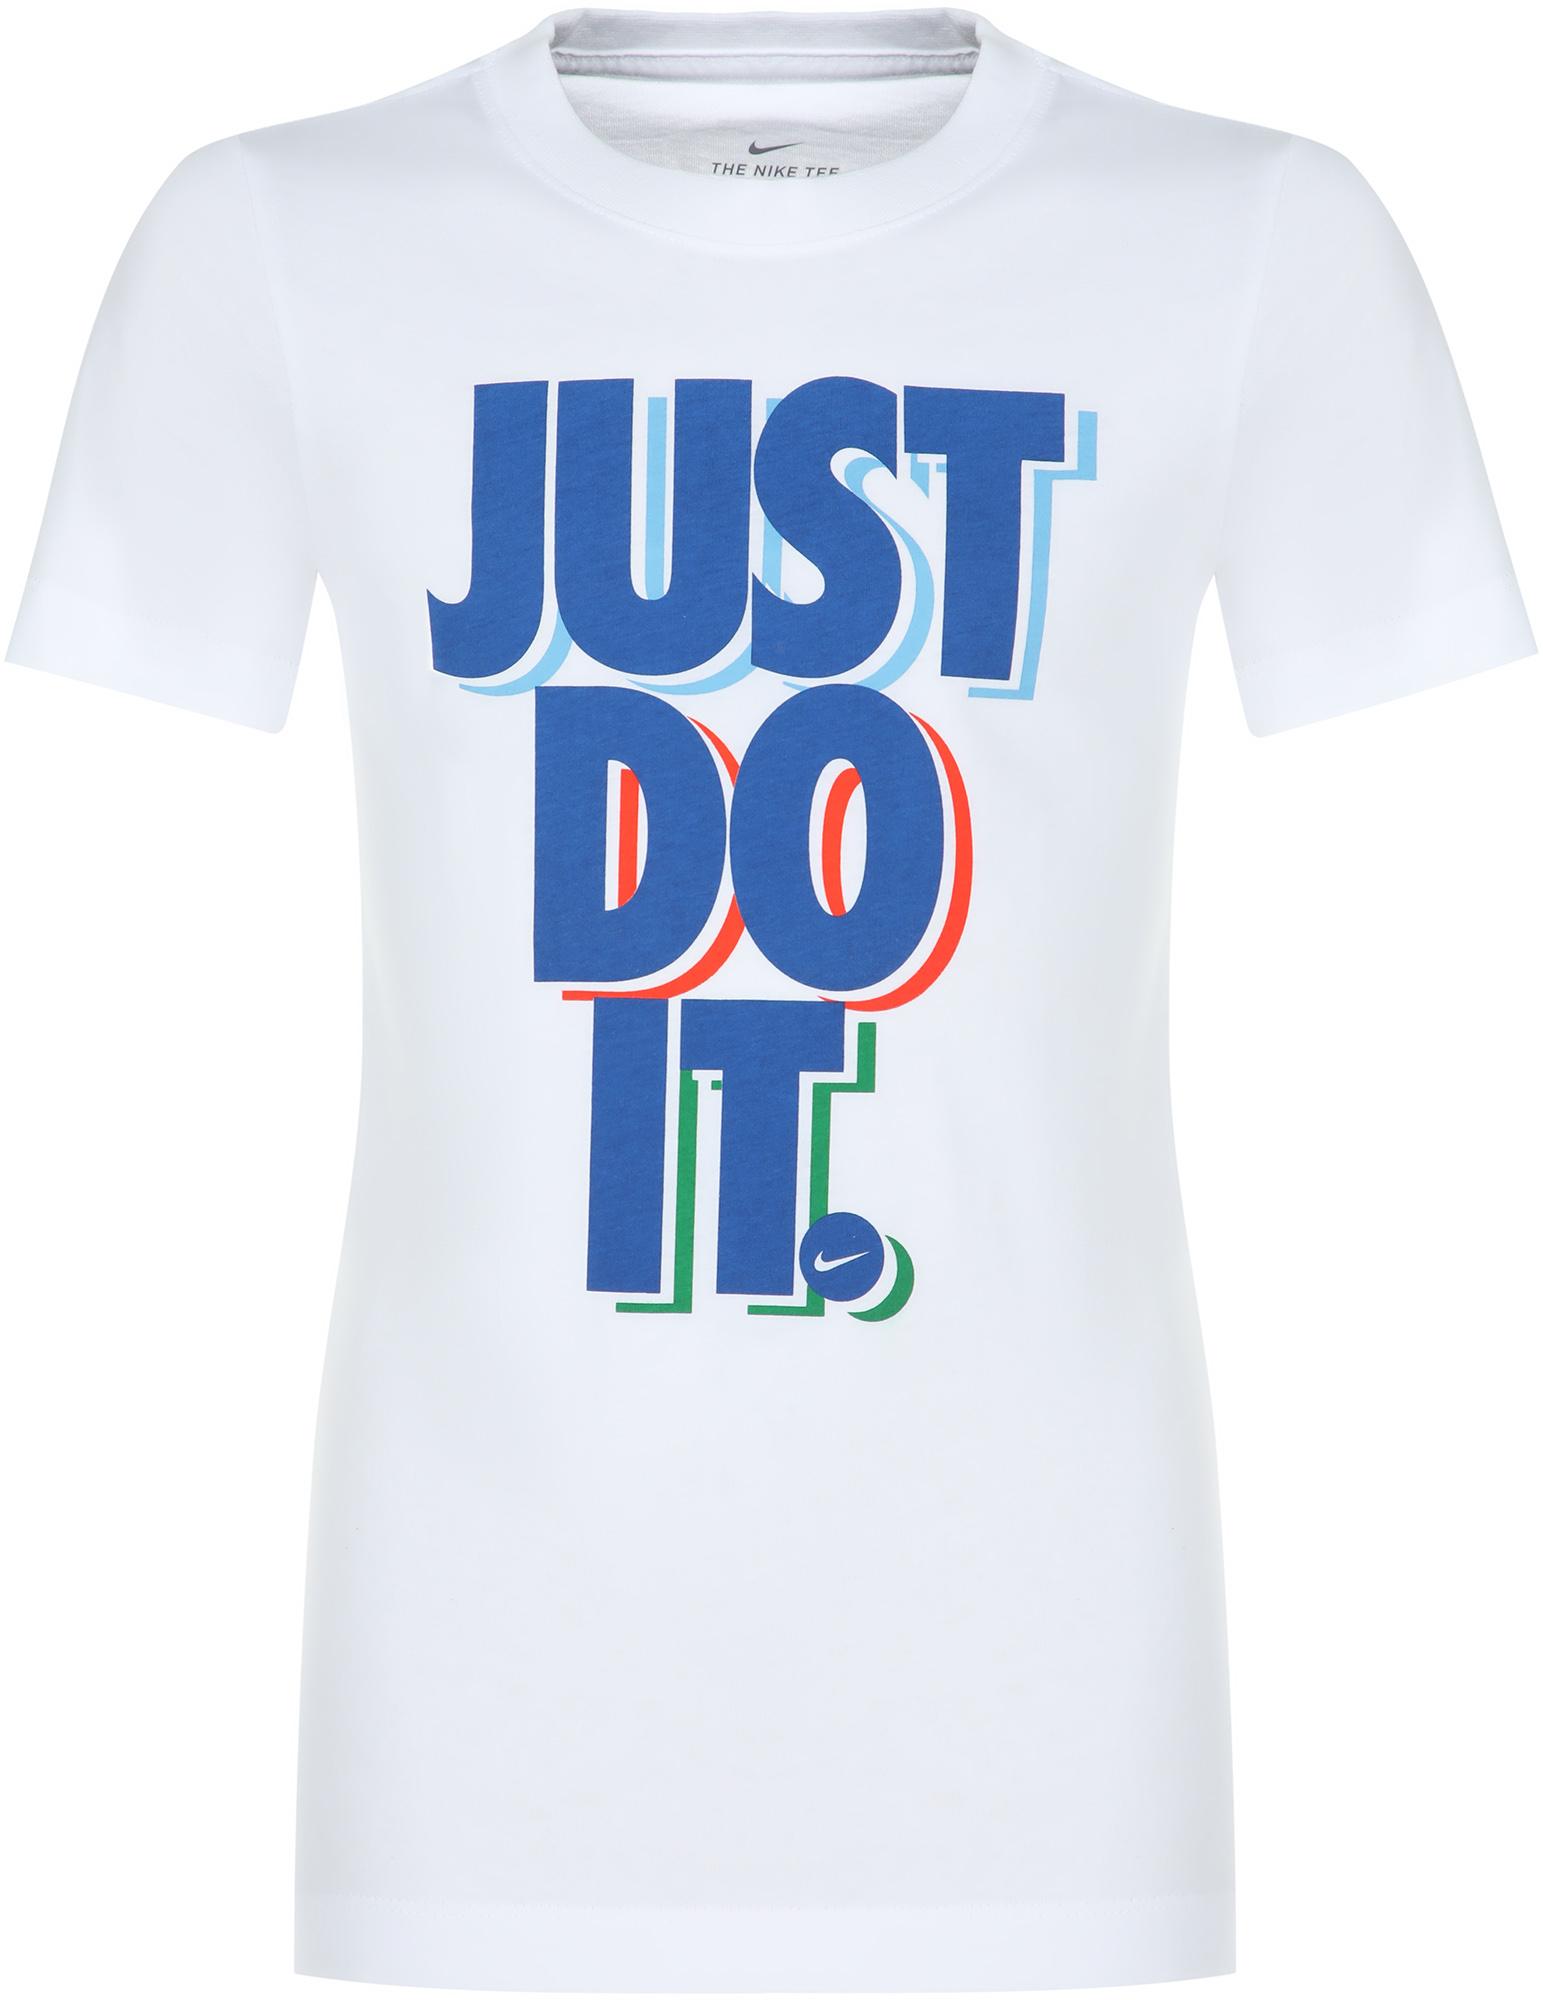 Фото - Nike Футболка для мальчиков Nike Sportswear Just Do It, размер 147-158 nike свитшот мужской nike sportswear just do it размер 52 54